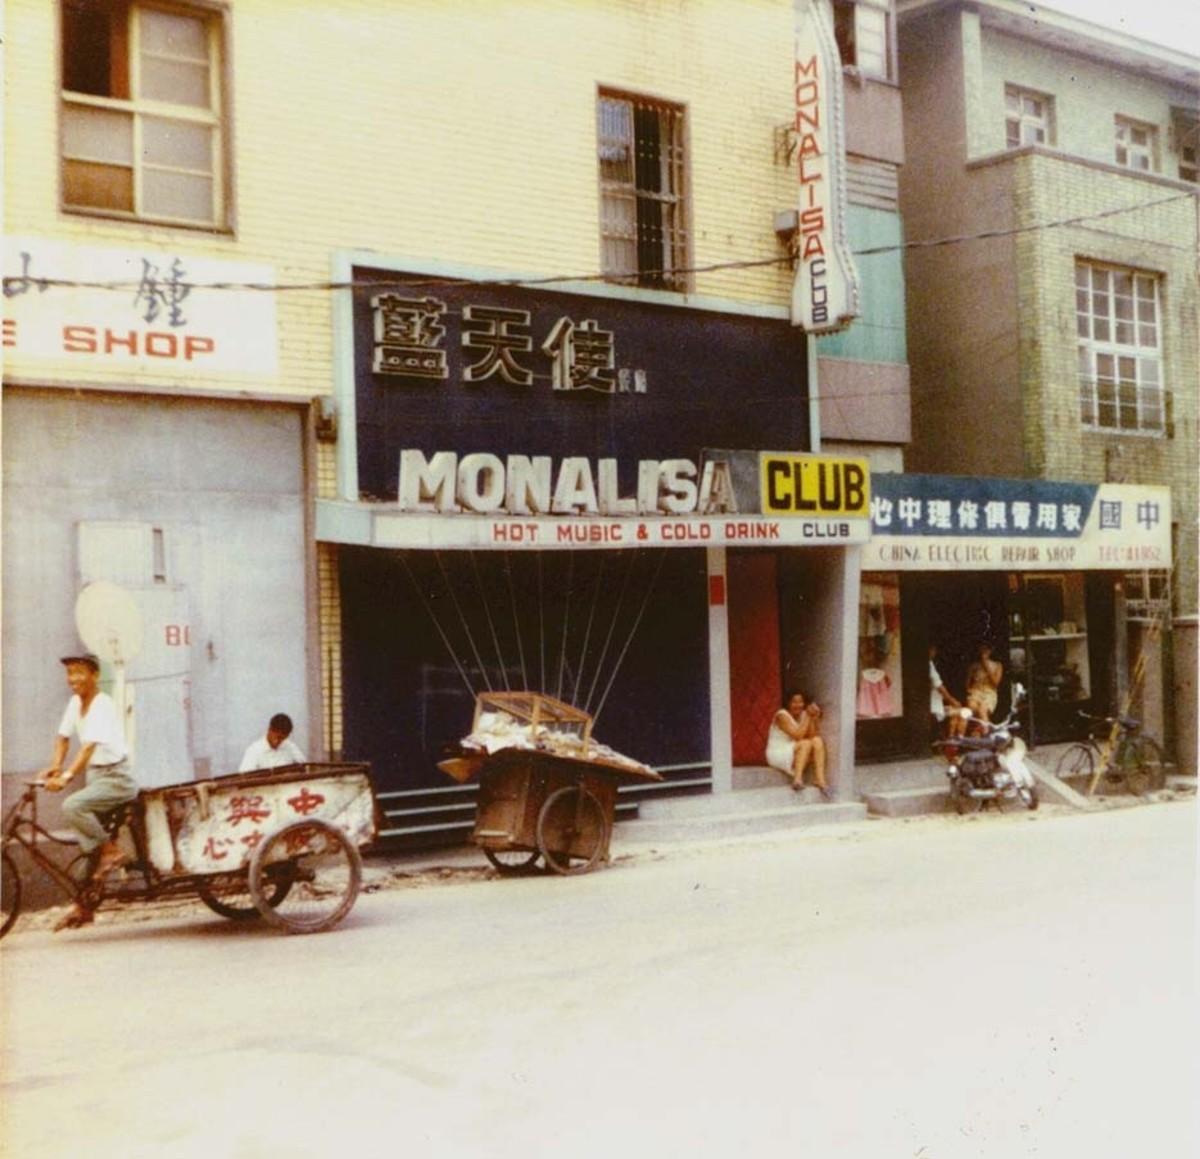 Mona Lisa Club on Fushun St. was my favorite hangout.  Taken around 1969